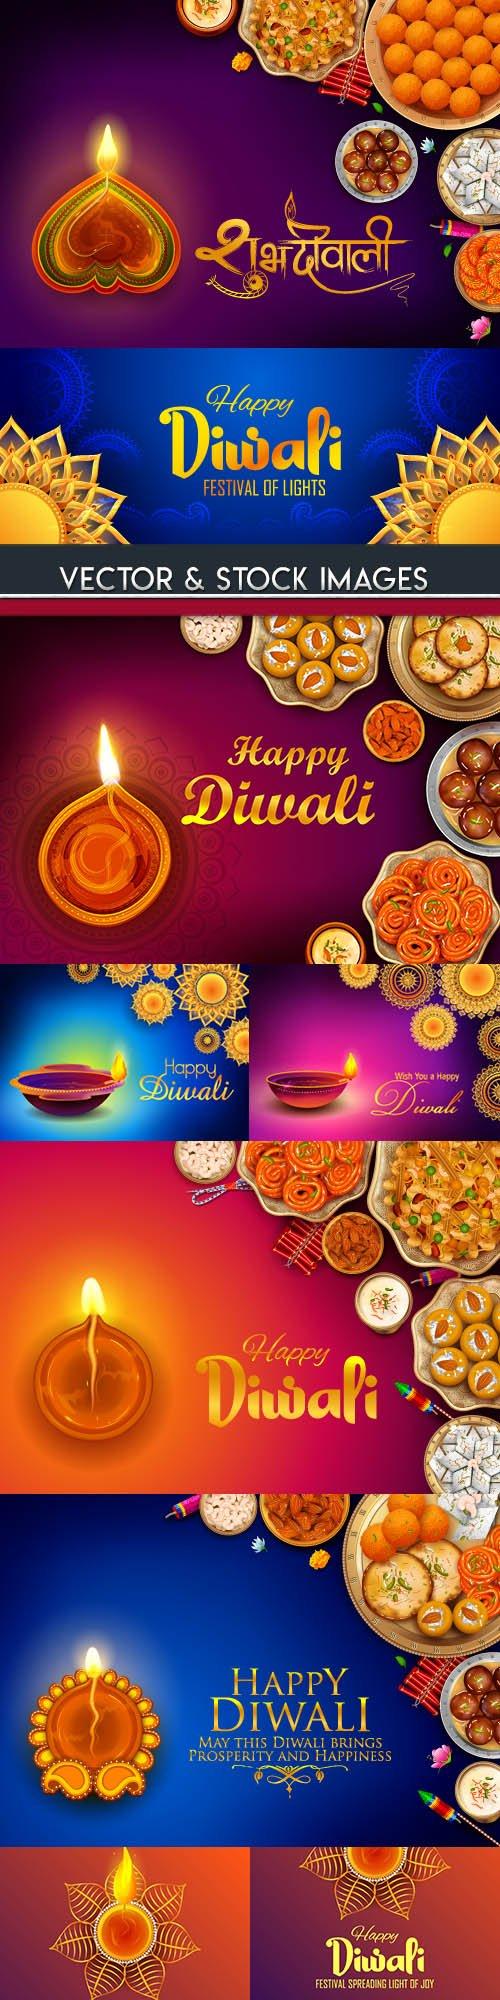 Diwali Indian traditional culture decoration illustration 5